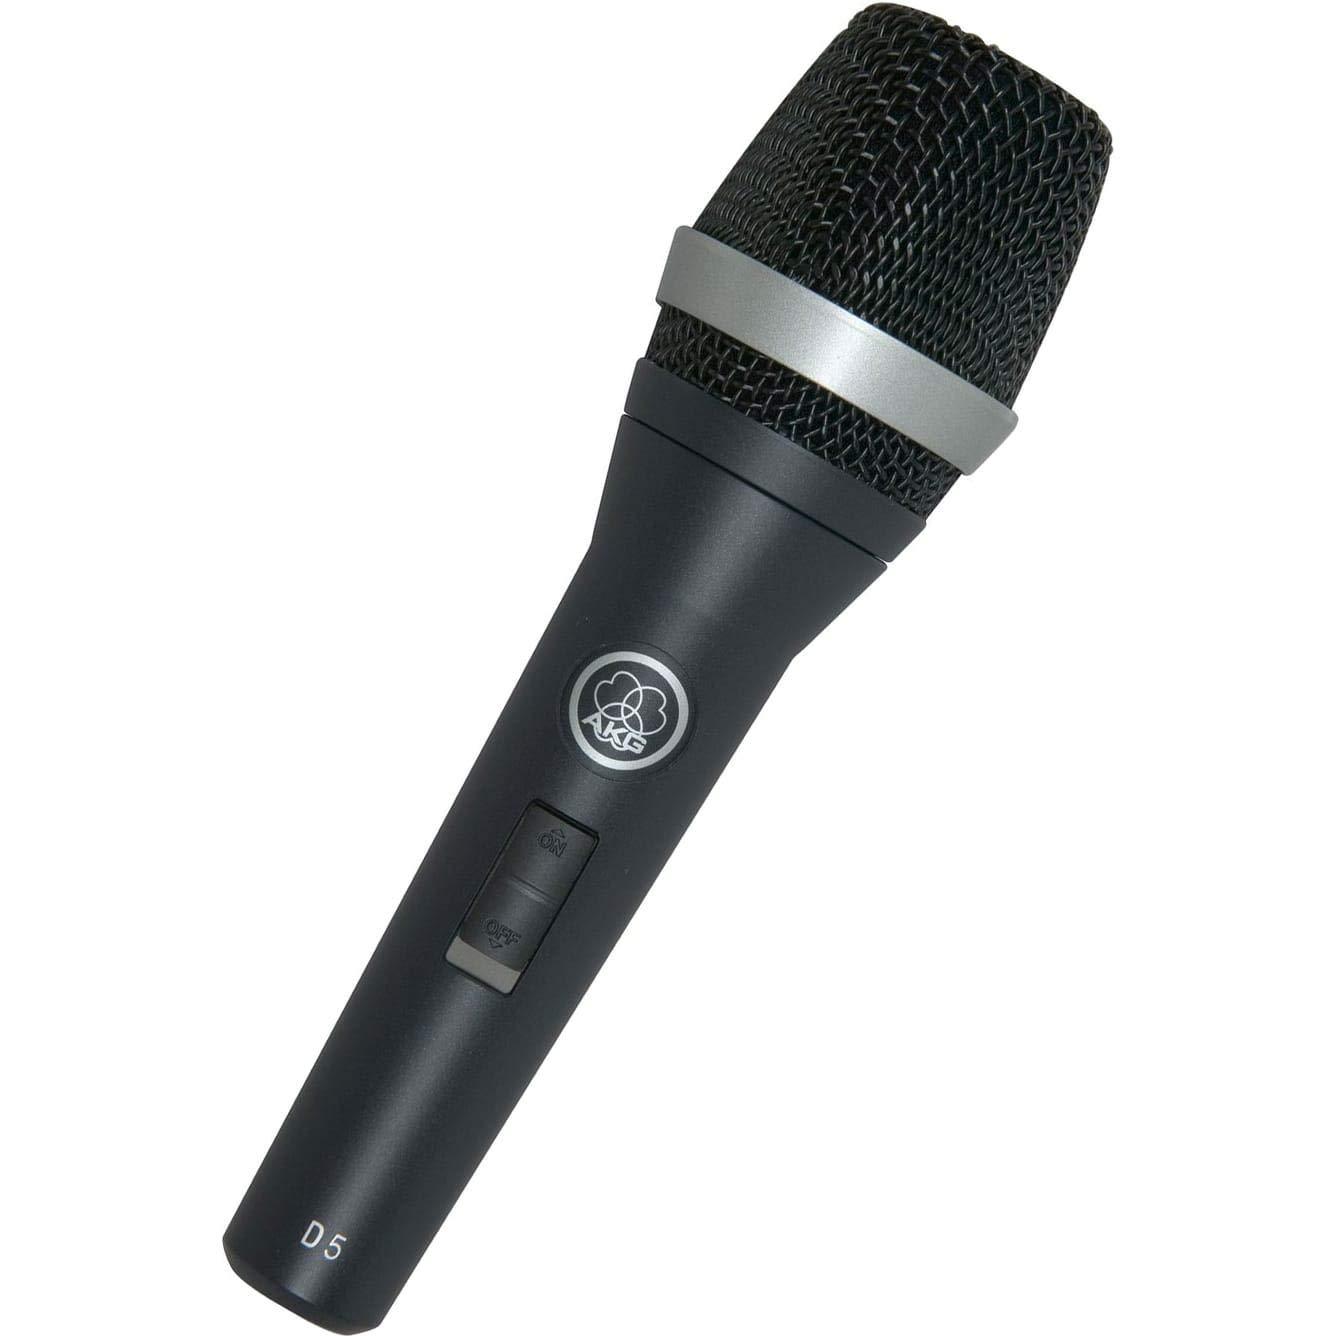 Micr/ófono din/ámico AKG D5S para voz, de mano